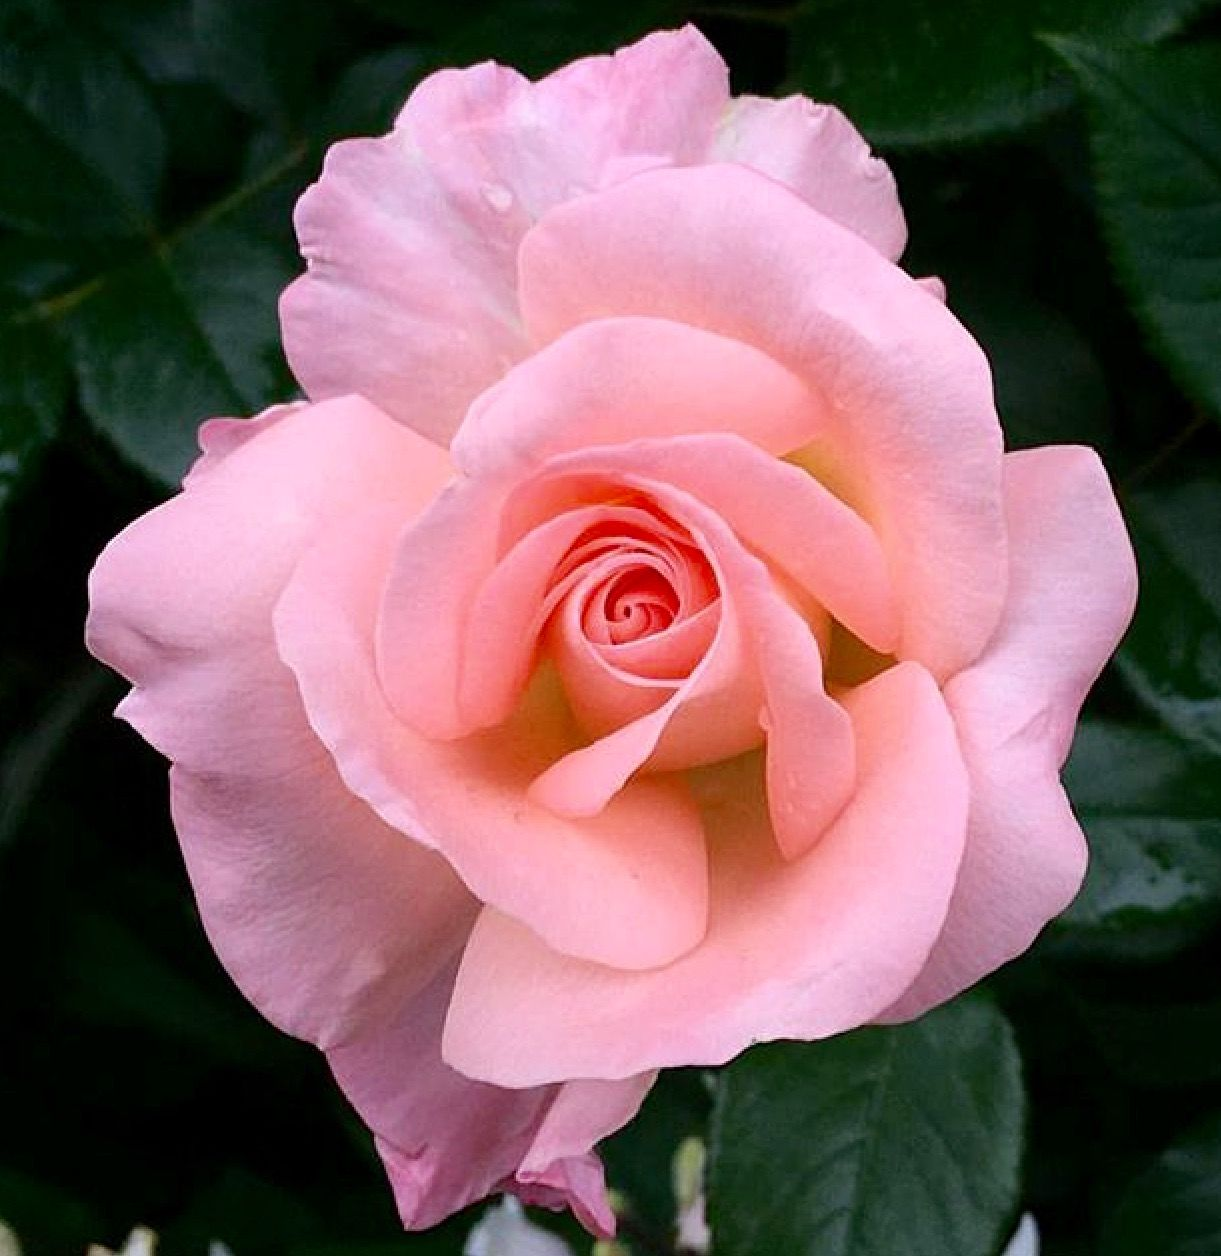 Pin by ayegl yney on glistan pinterest flowers beautiful single flowers pink roses beautiful flowers pasta roses hot pink flowers nature pretty flowers simple flowers izmirmasajfo